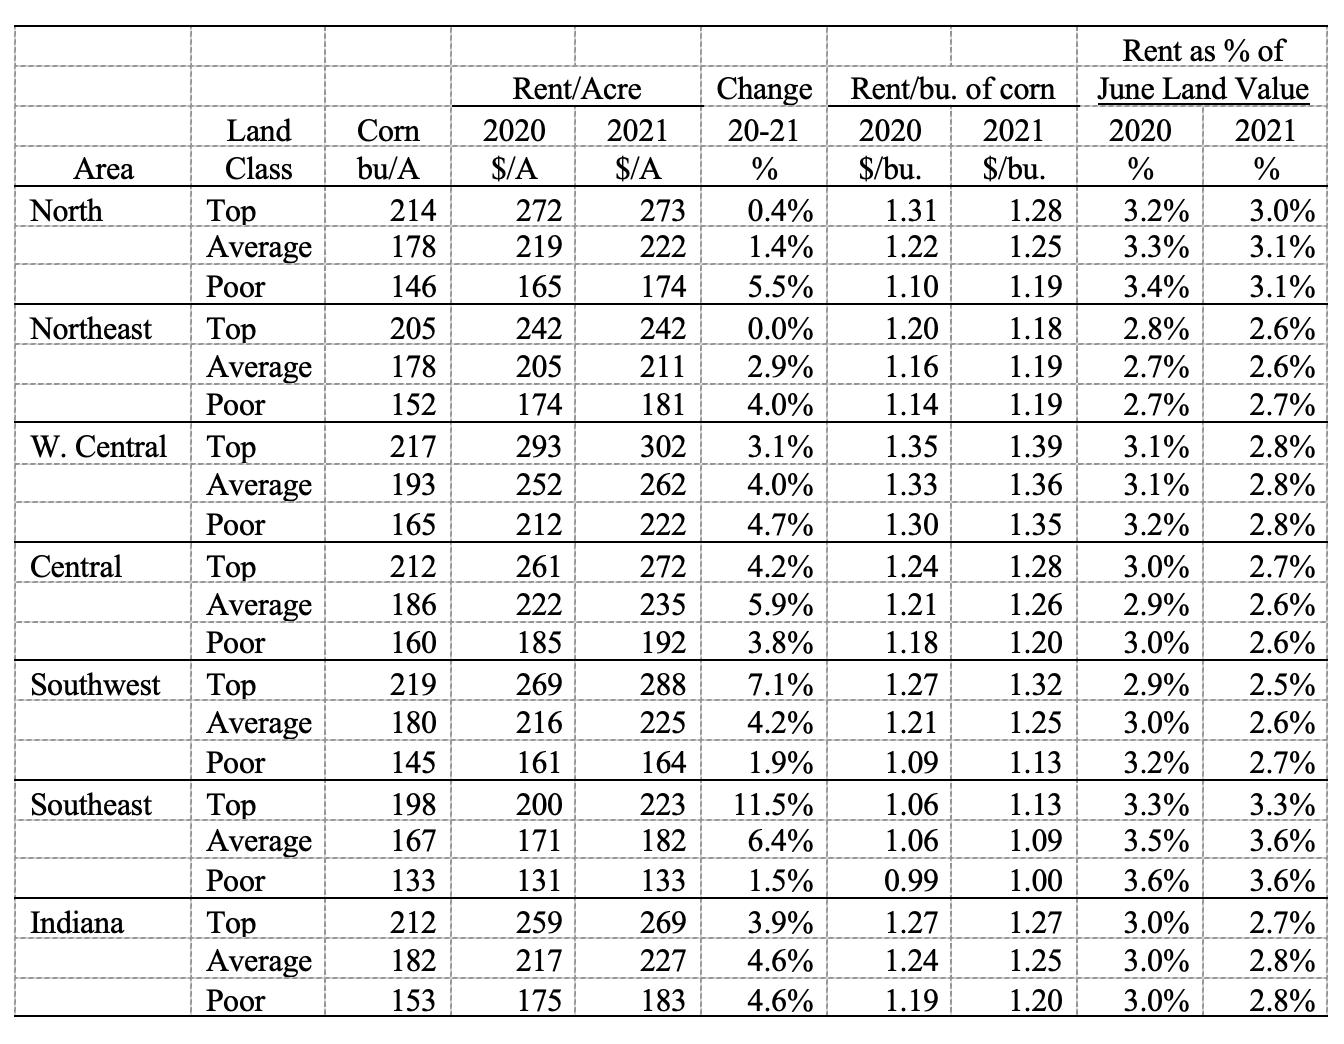 Table 4: Average estimated Indiana cash rent per acre, (tillable, bare land) 2020 and 2021, Purdue Land Value Survey, June 2021